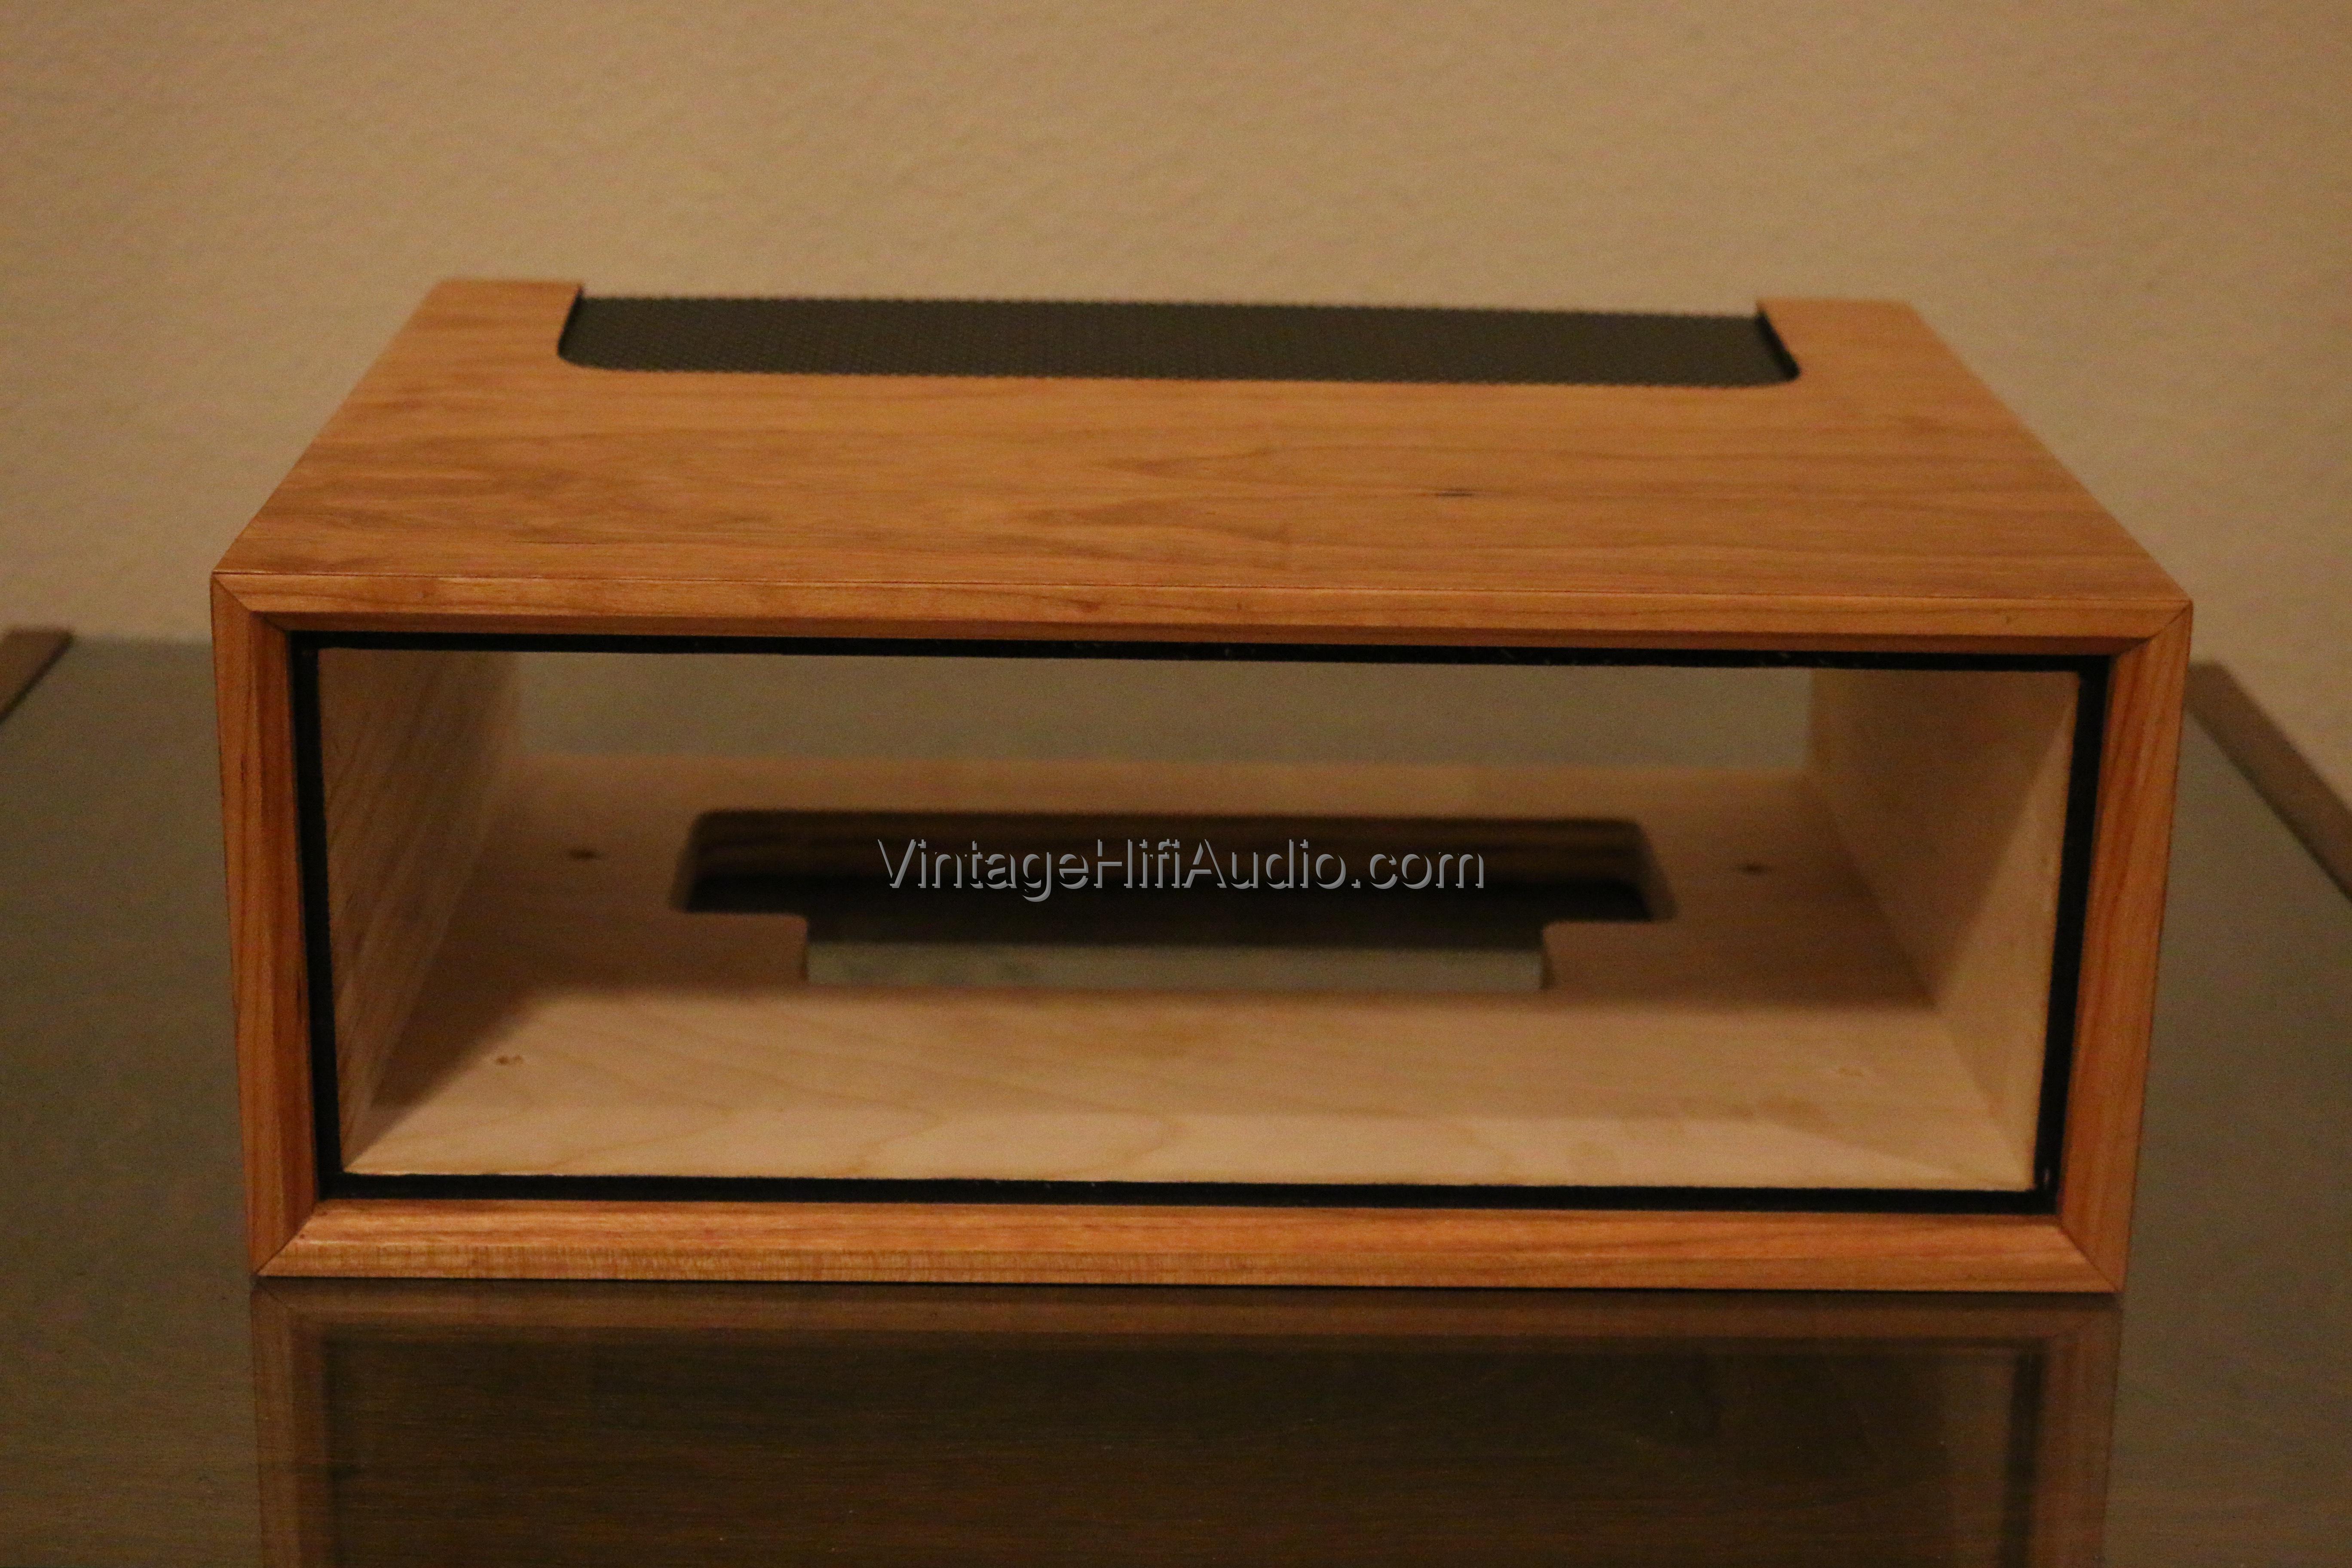 marantz wc 10 wood case vintage hifi audio. Black Bedroom Furniture Sets. Home Design Ideas